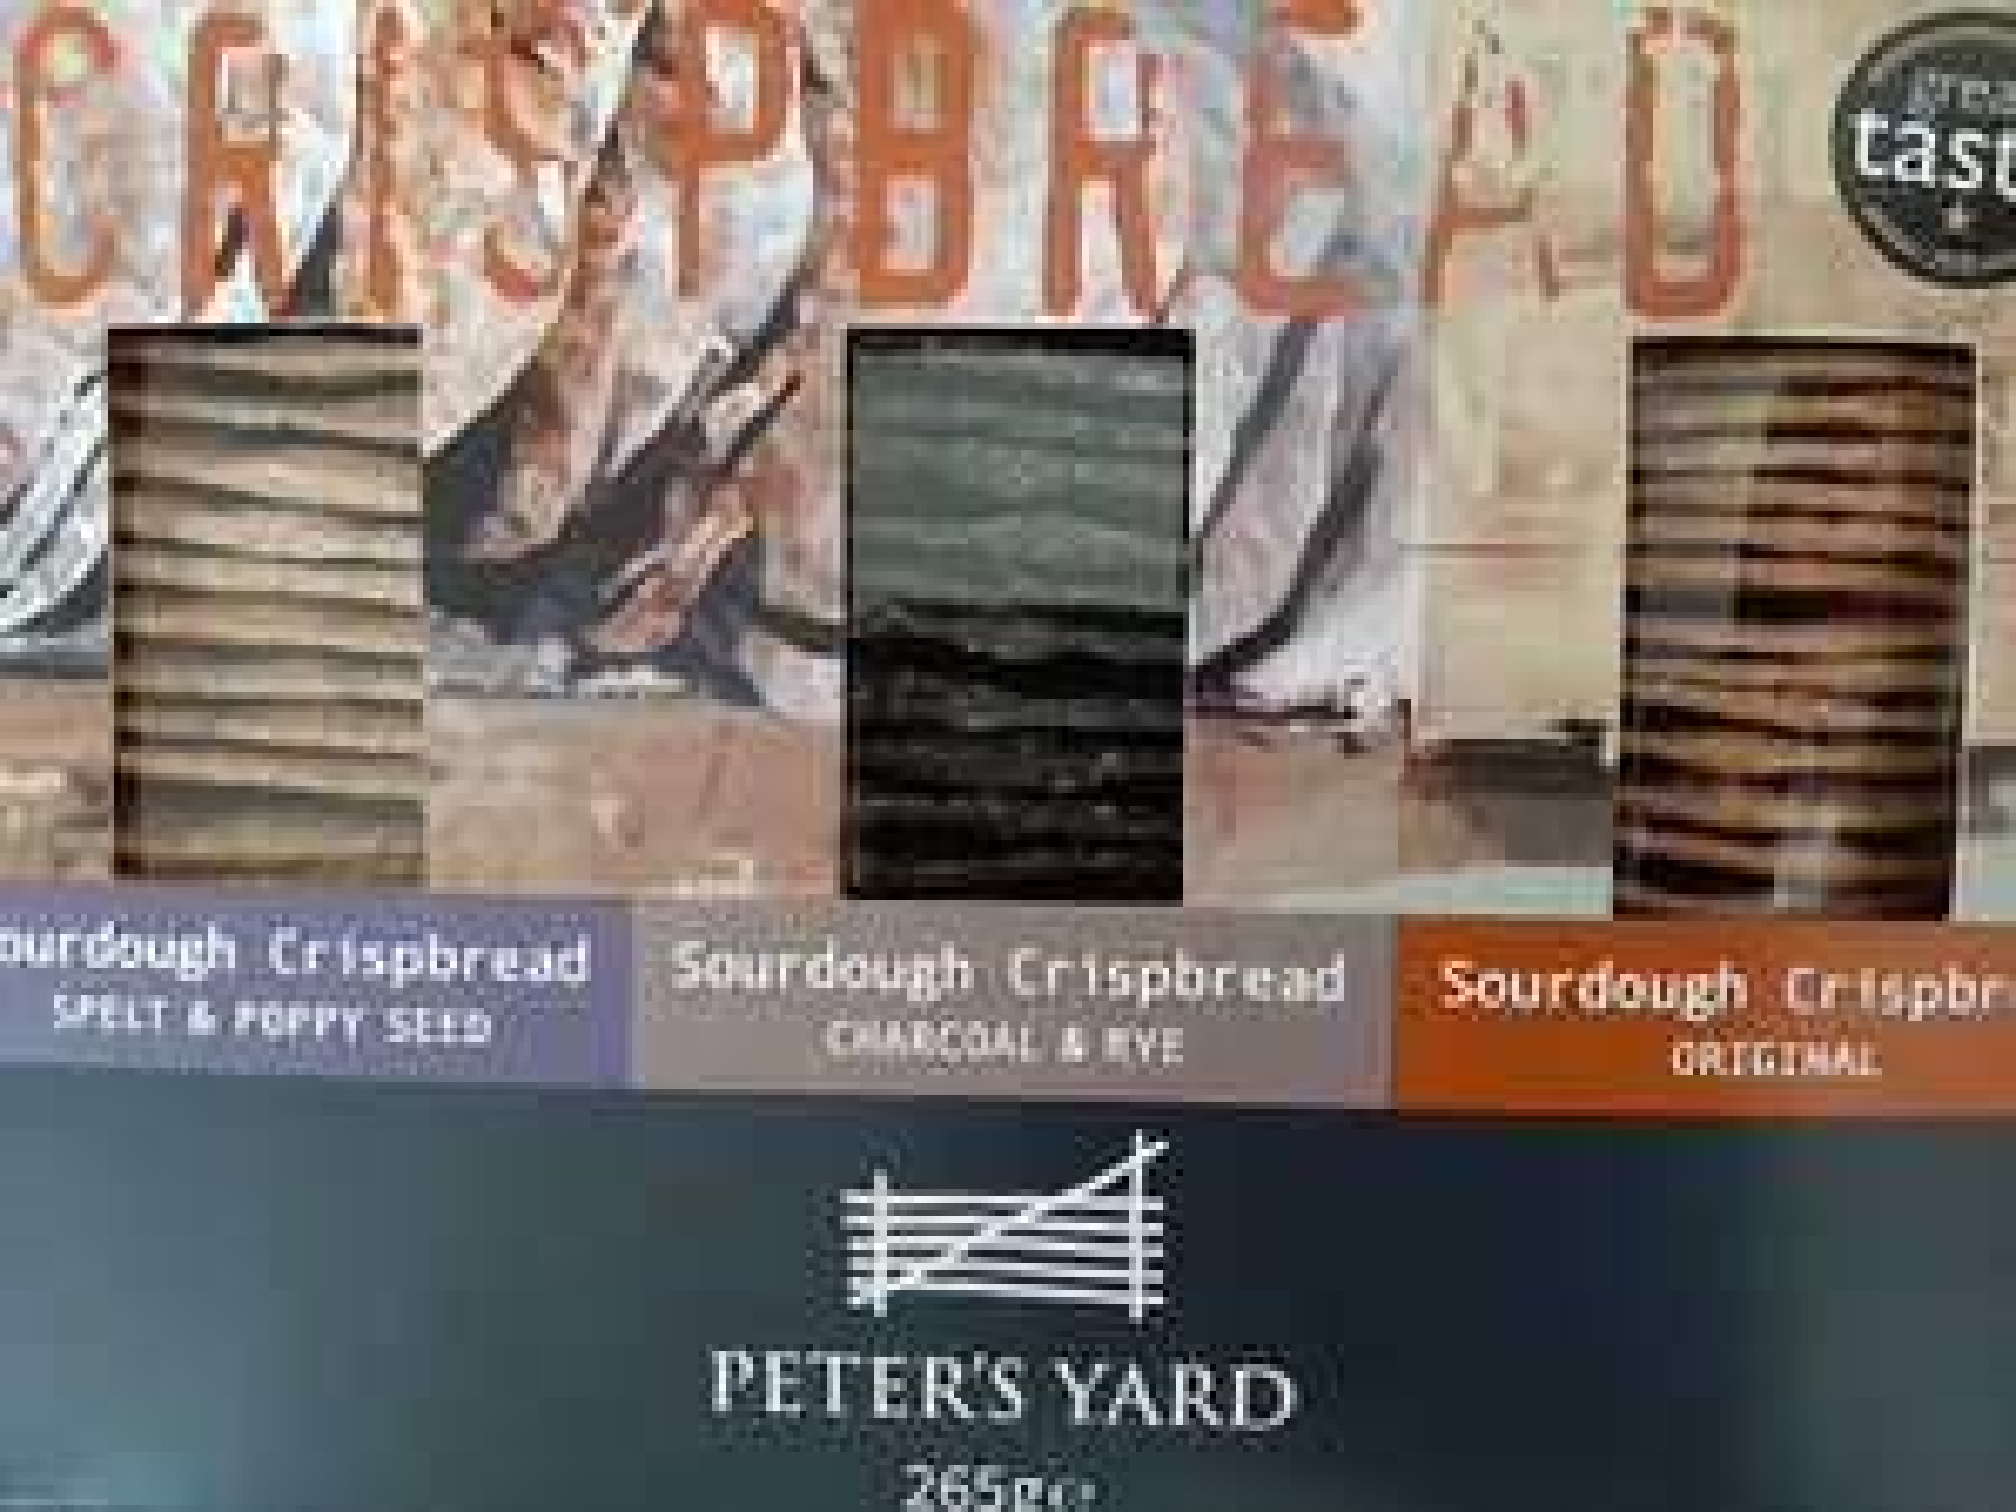 Peter's Yard Sourdough Crispbreads 200g, 70p @ Sainsburys Hanley